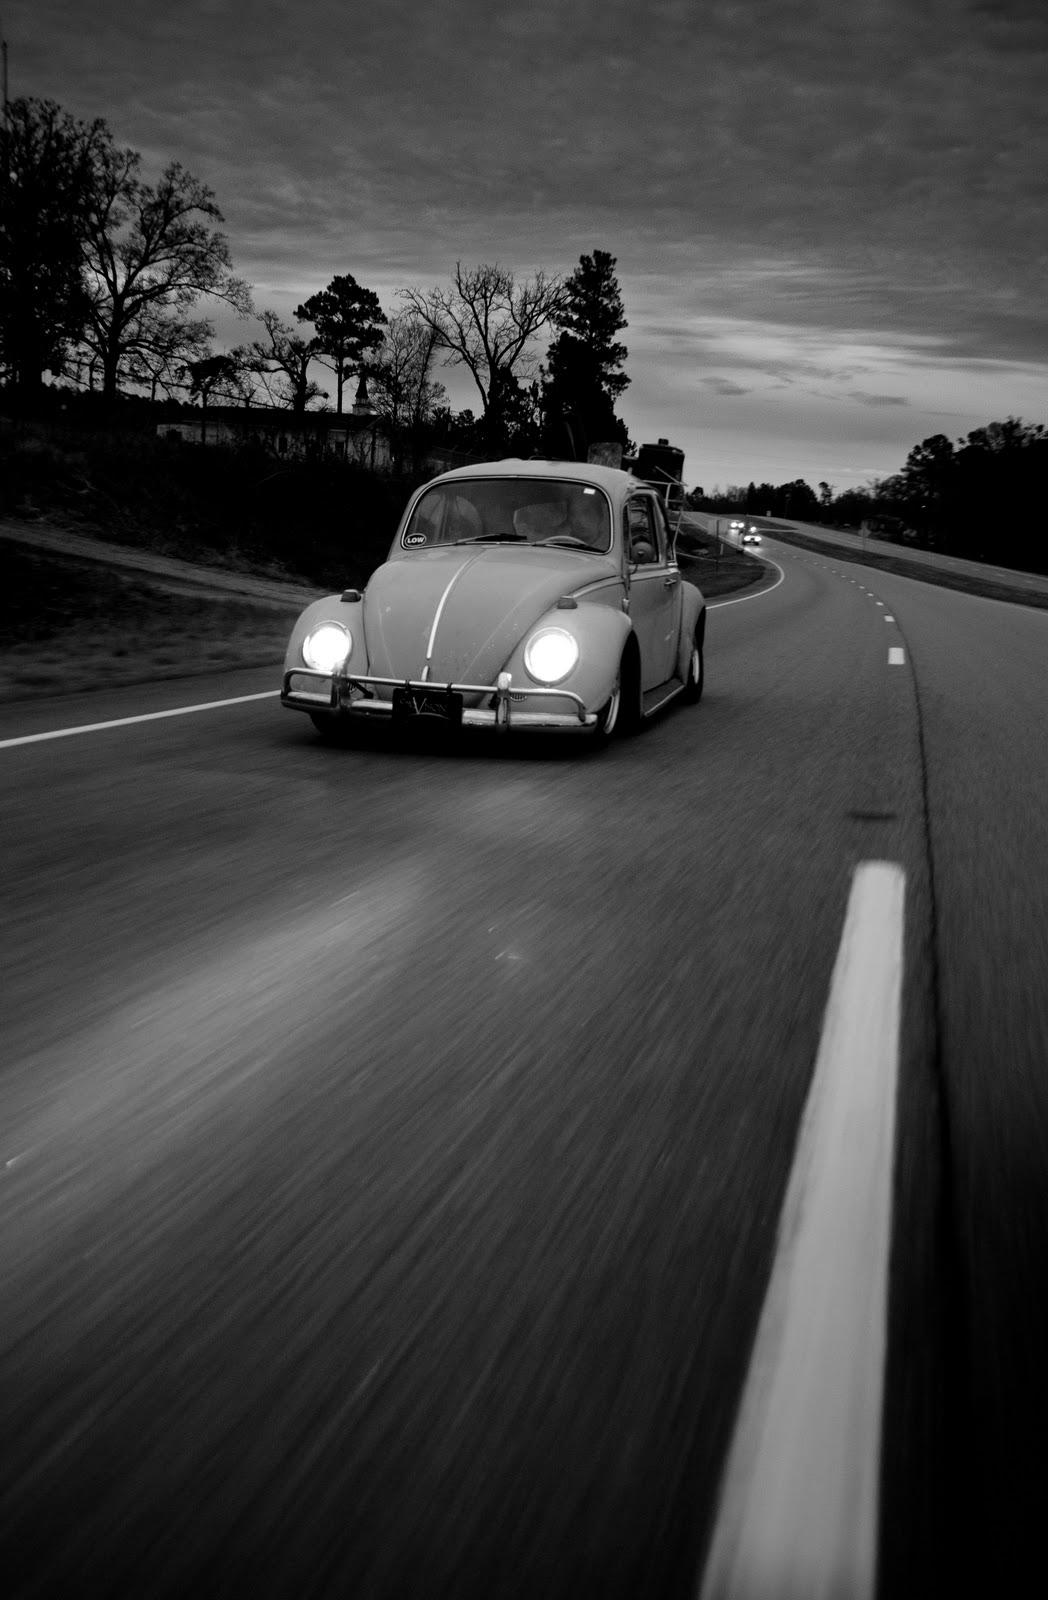 Otis - my '65 Beetle DSC_0070